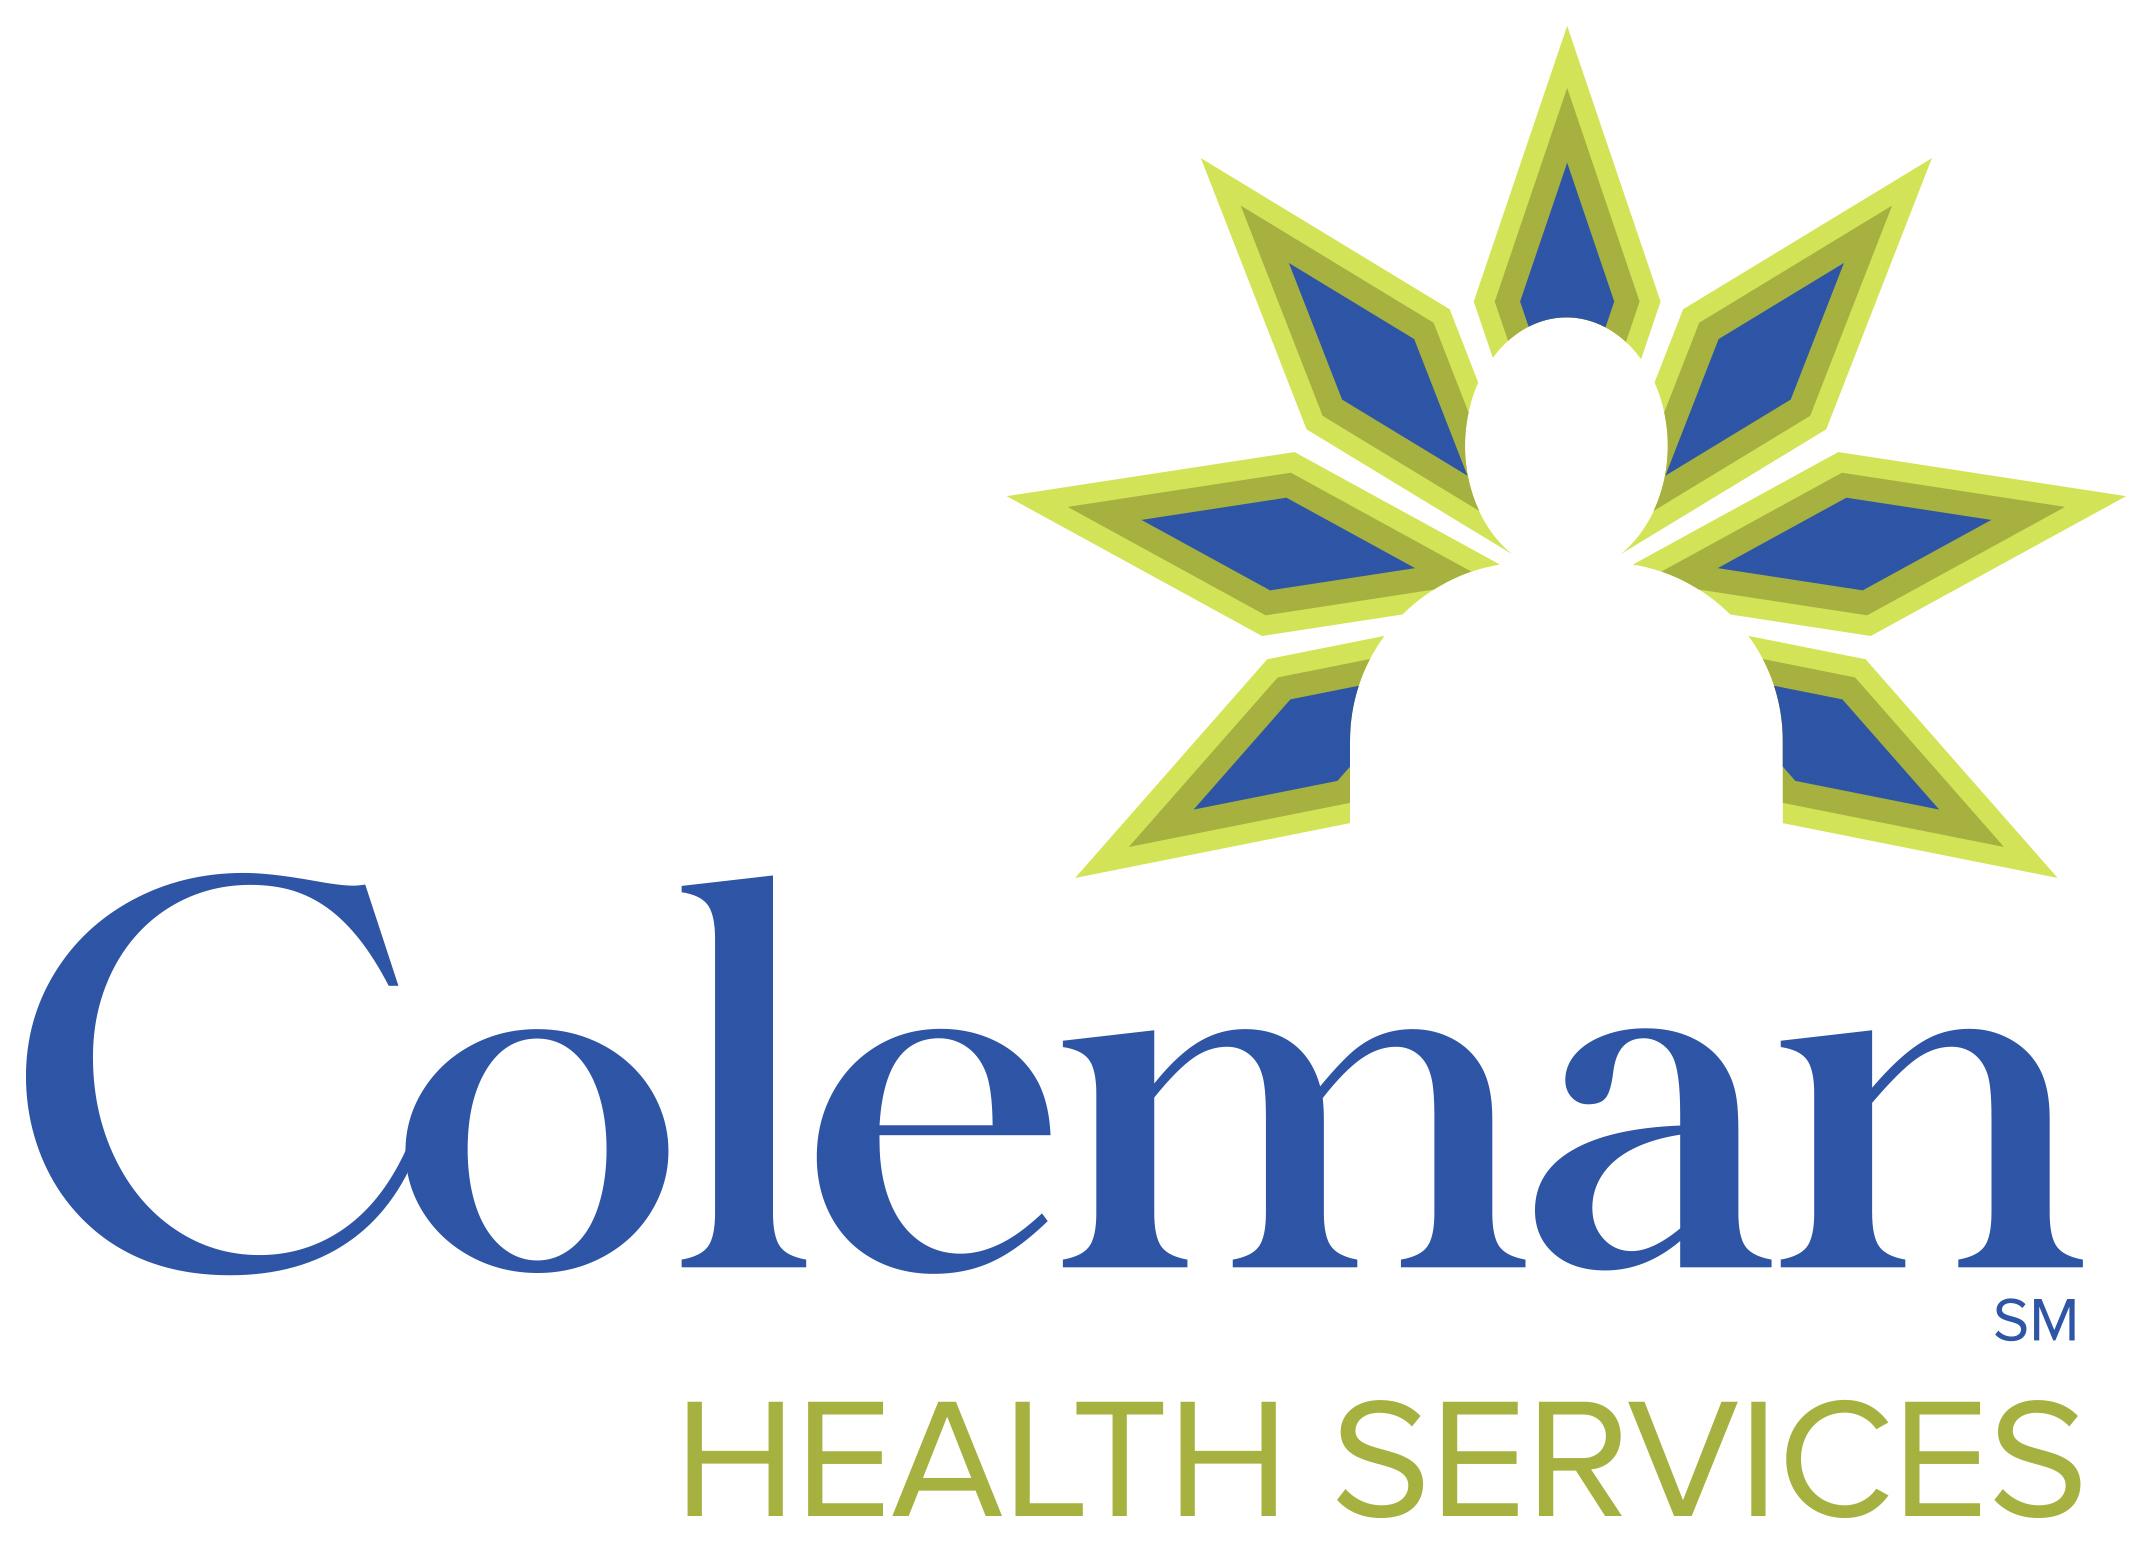 Coleman Health Services